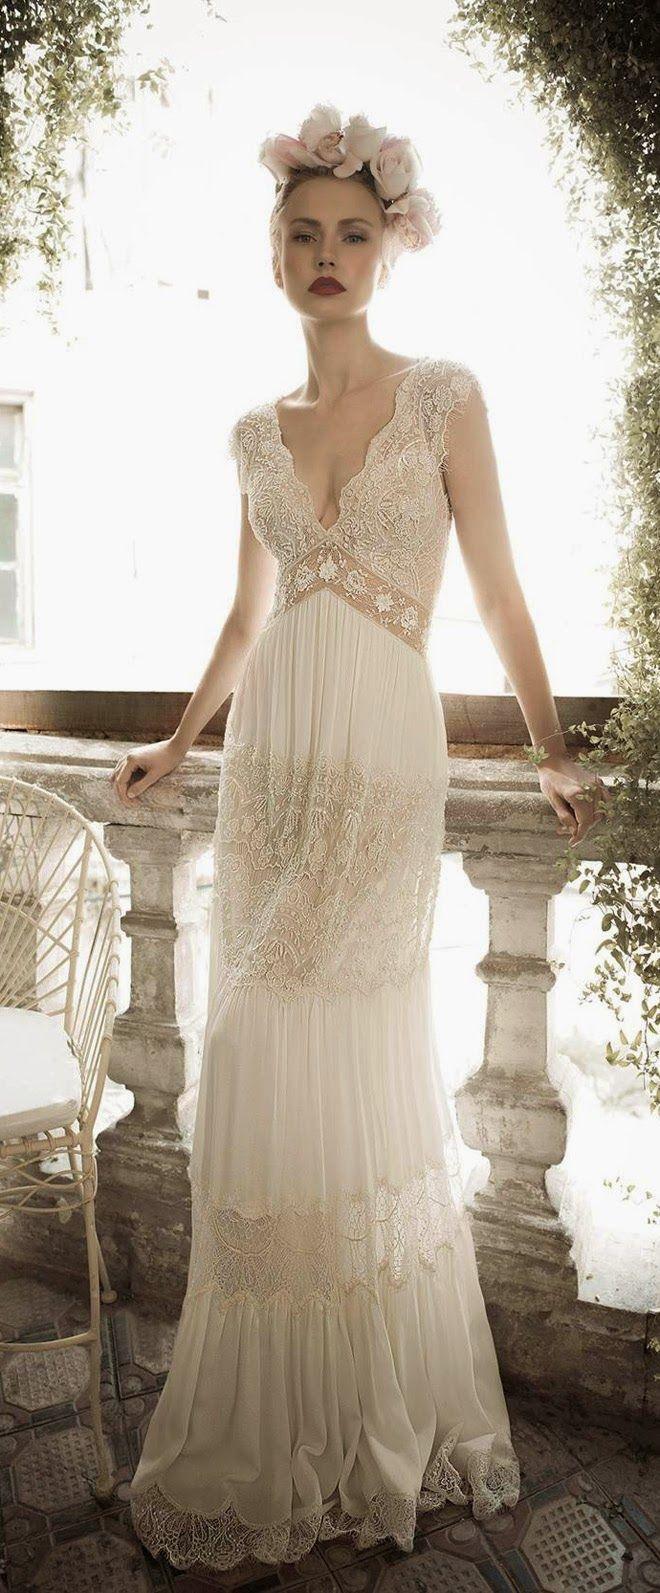 bohemian style weddings bohemian style wedding dress 25 Best Ideas about Bohemian Style Weddings on Pinterest Romantic style weddings Romantic and Bohemian style wedding dresses